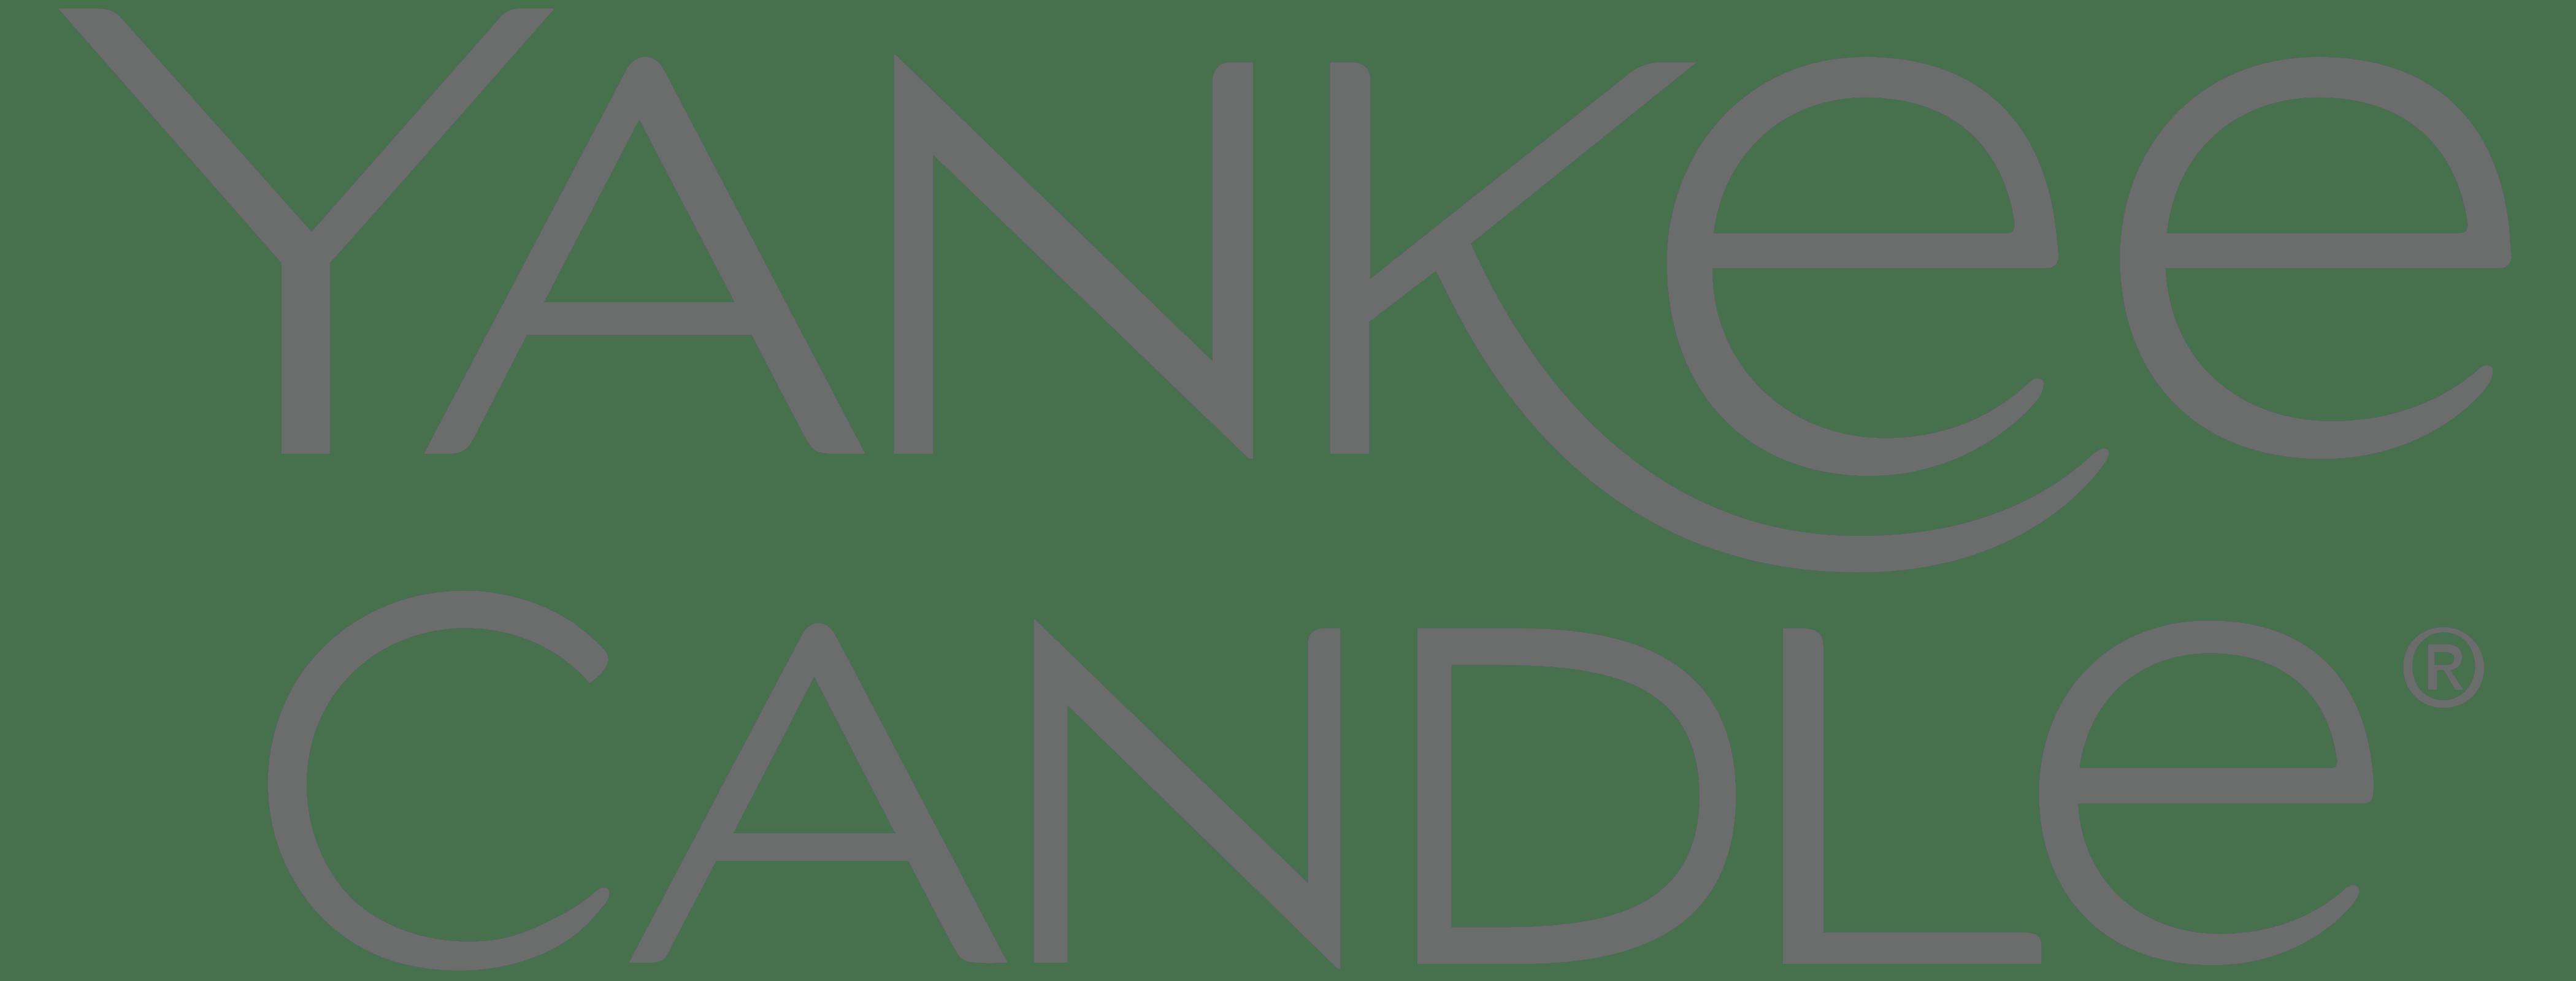 Yankee Candle Semi-Annual Clearance Sale